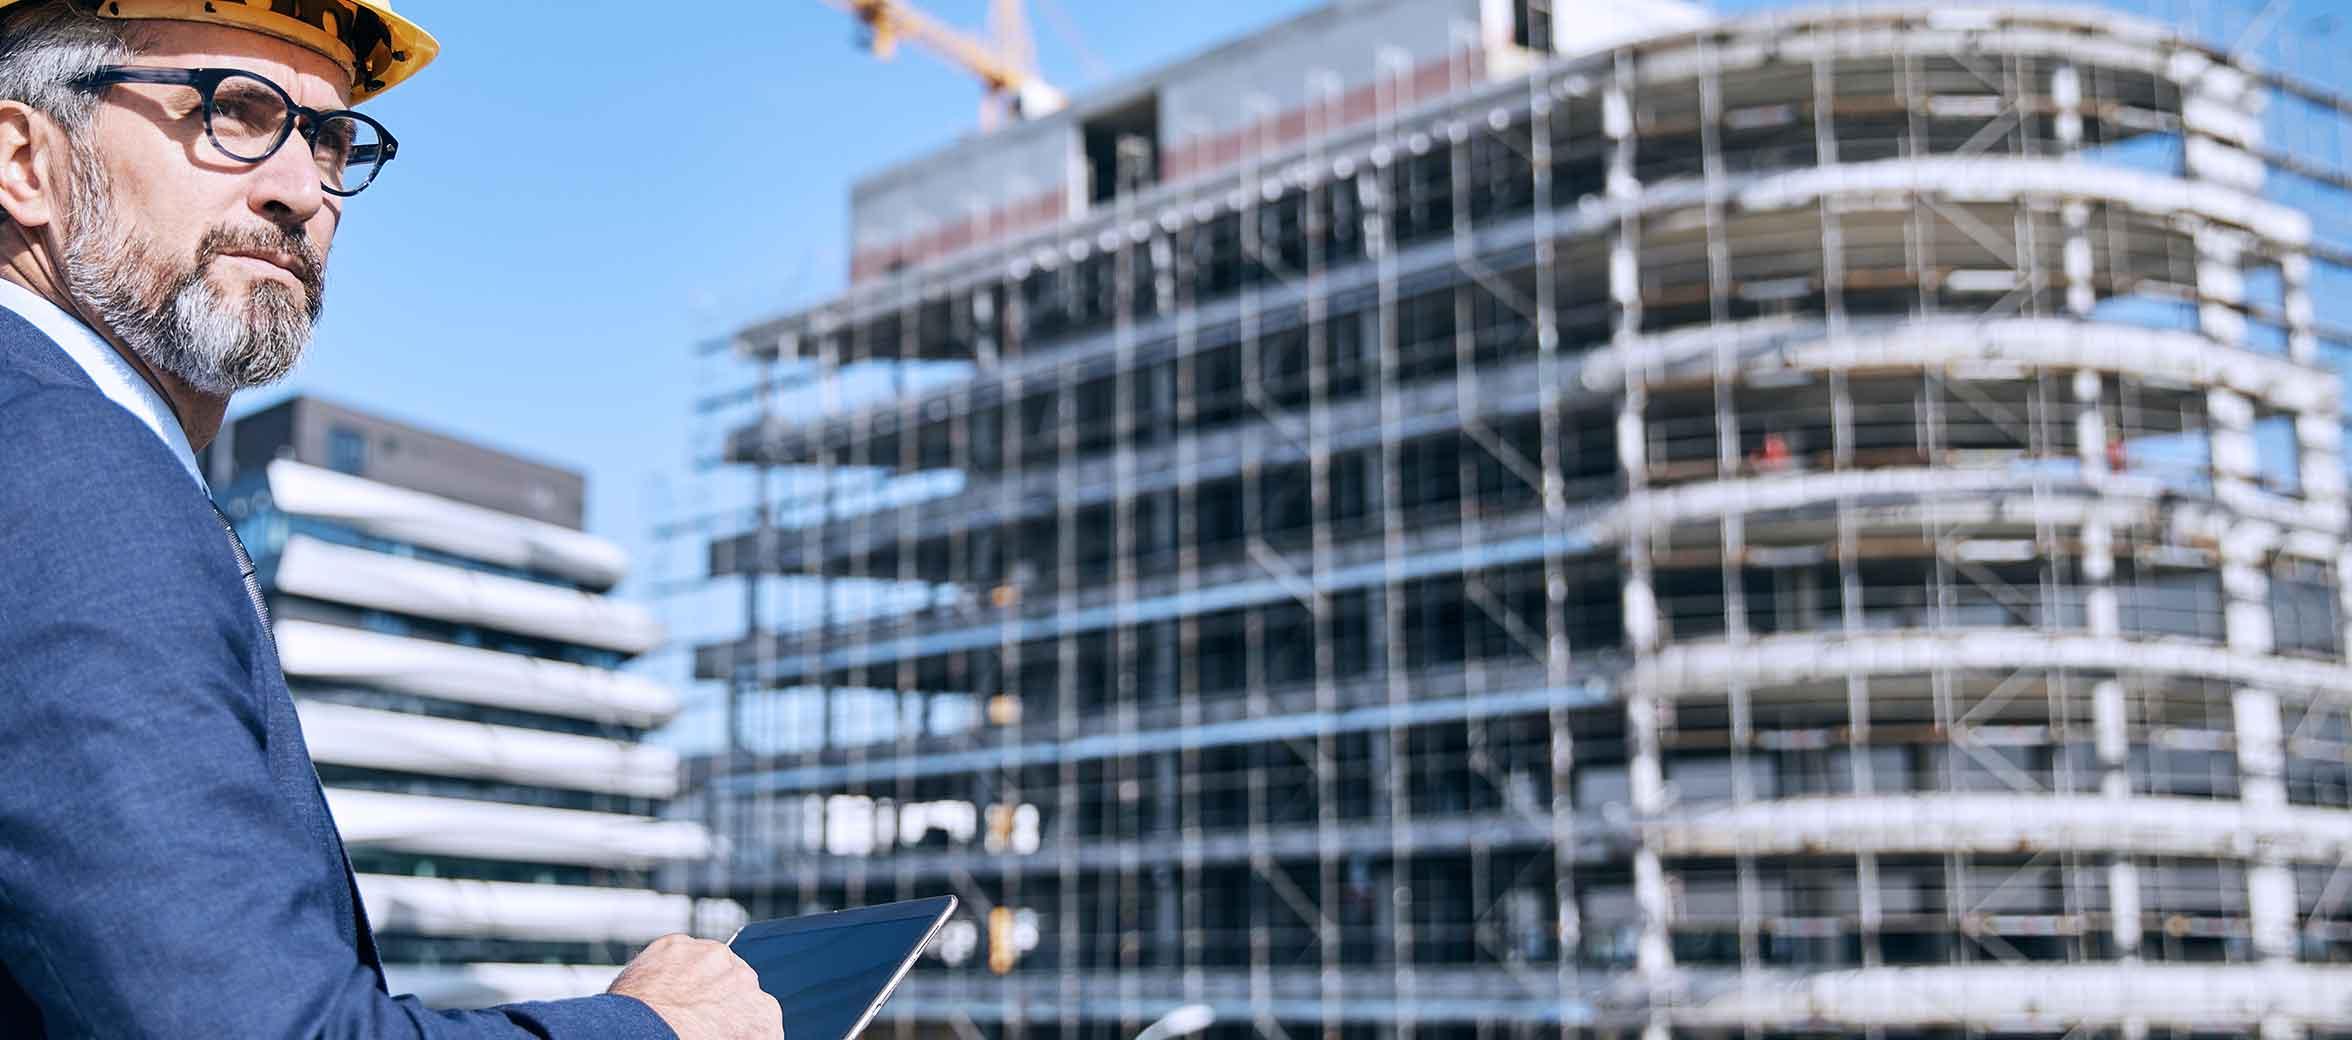 Project & Development Services